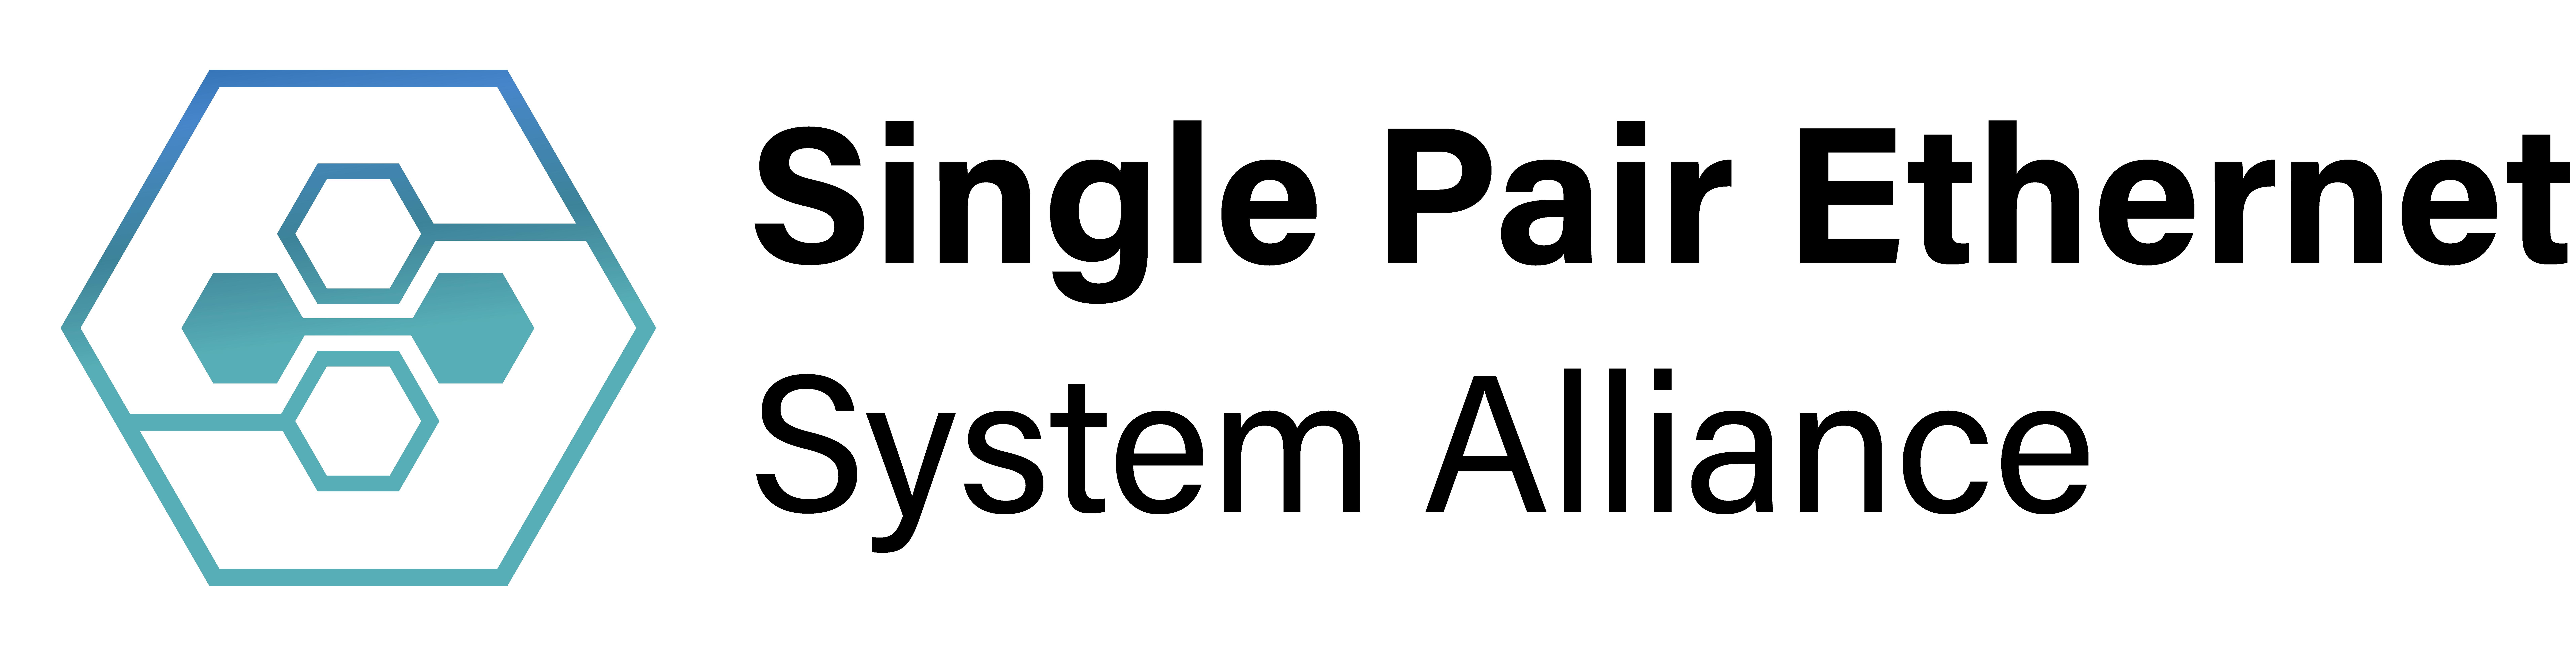 SPE System Alliance